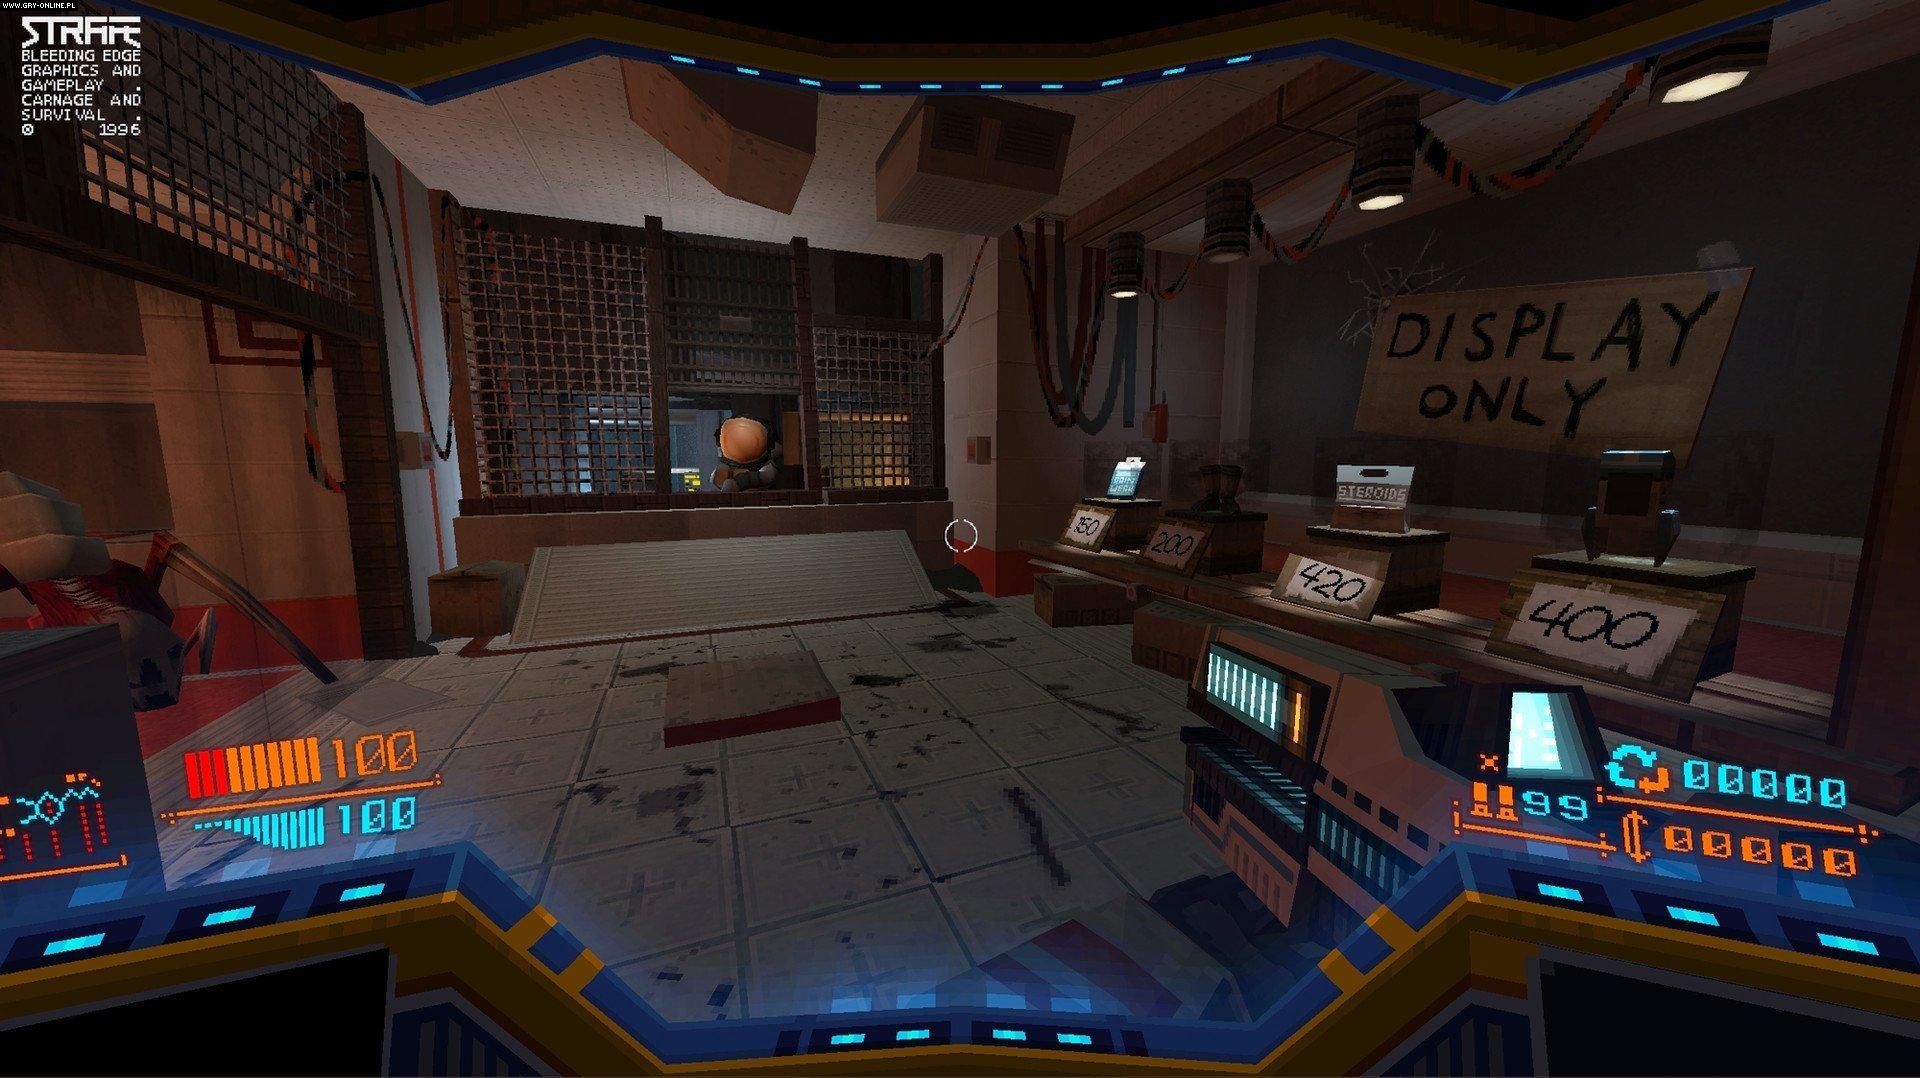 Strafe PC, PS4 Games Image 19/19, Pixel Titans, Devolver Digital